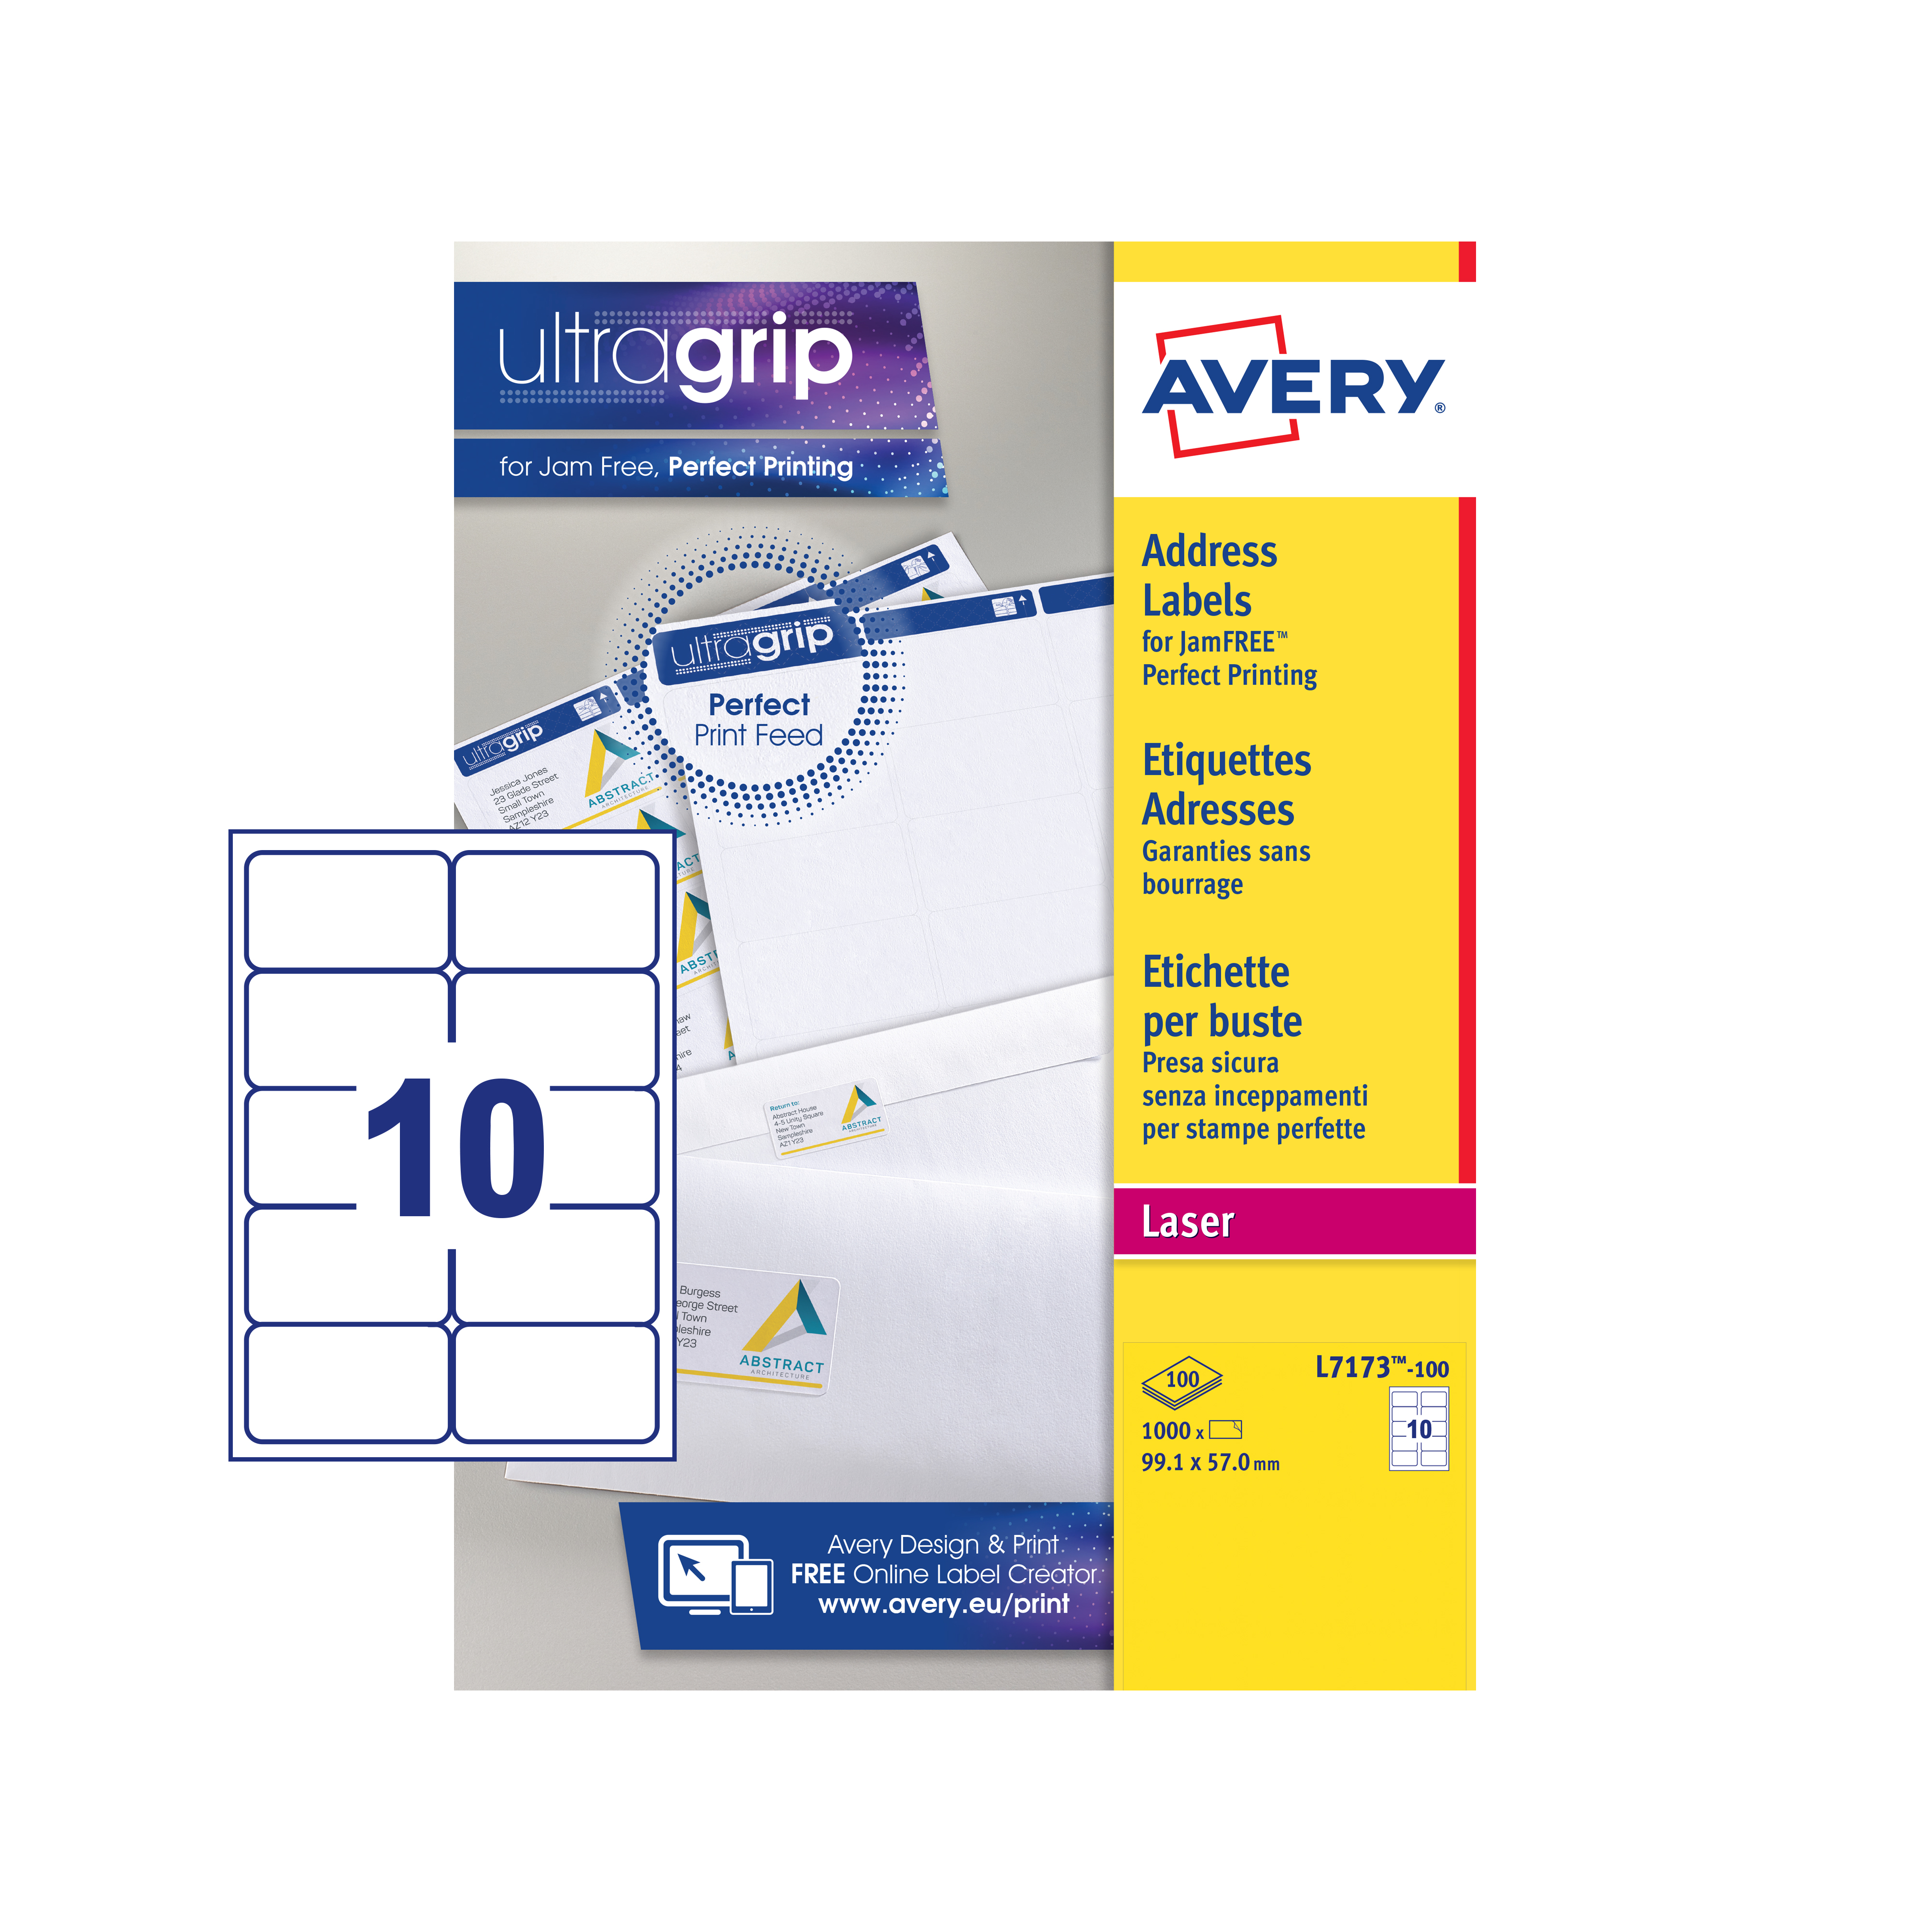 avery addressing labels laser jam free 10 per sheet 99 1x57mm white